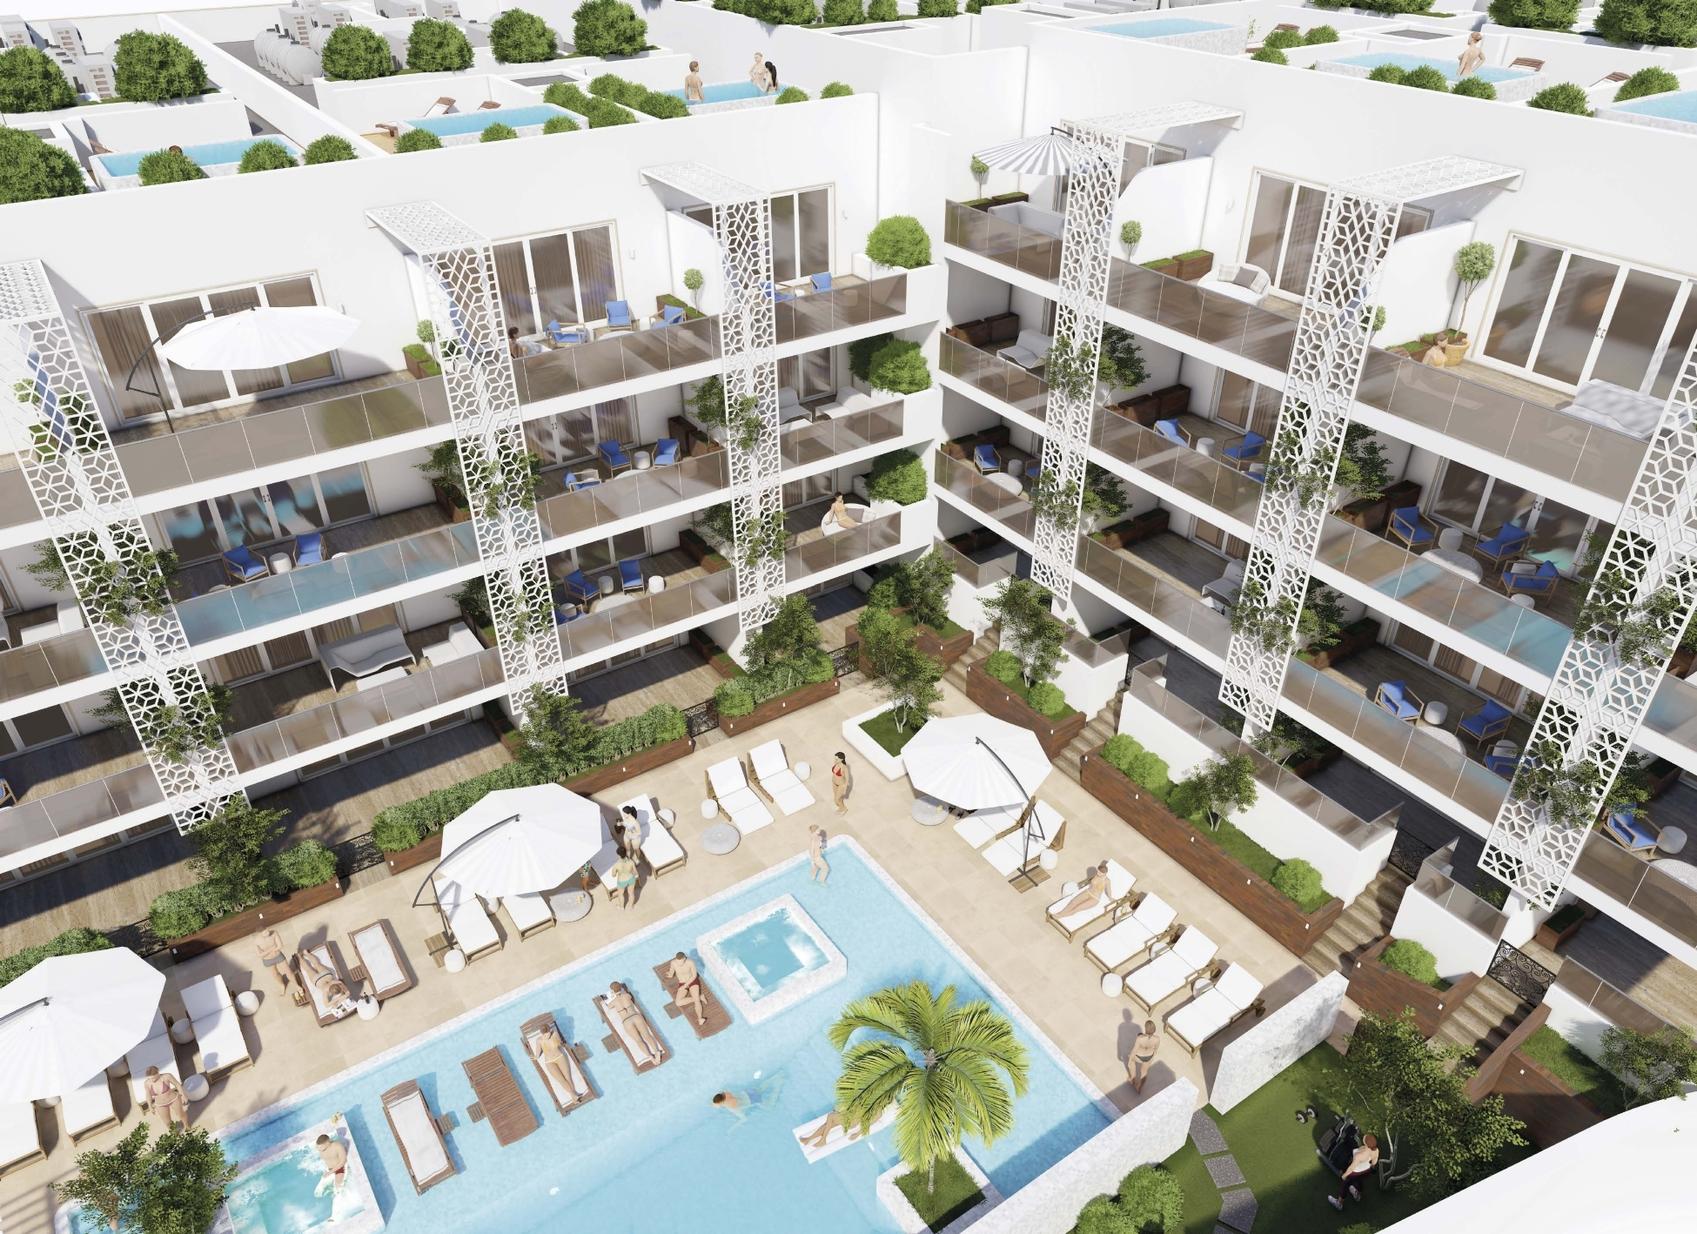 3 bed Apartment For Sale in Balzan, Balzan - thumb 3